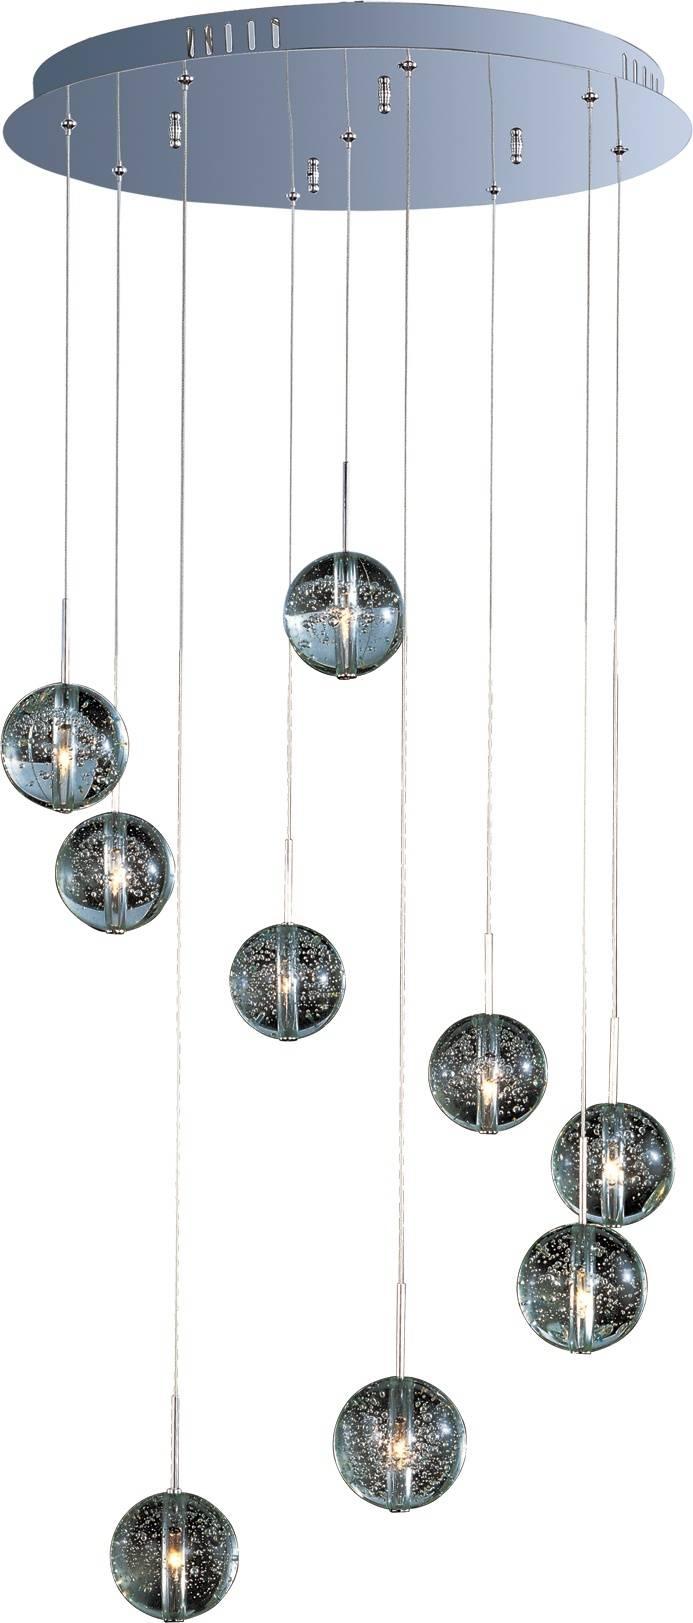 51 Best Et2 Lighting Images On Pinterest | Pendant Lights, Multi intended for Multiple Pendant Lights Fixtures (Image 1 of 15)